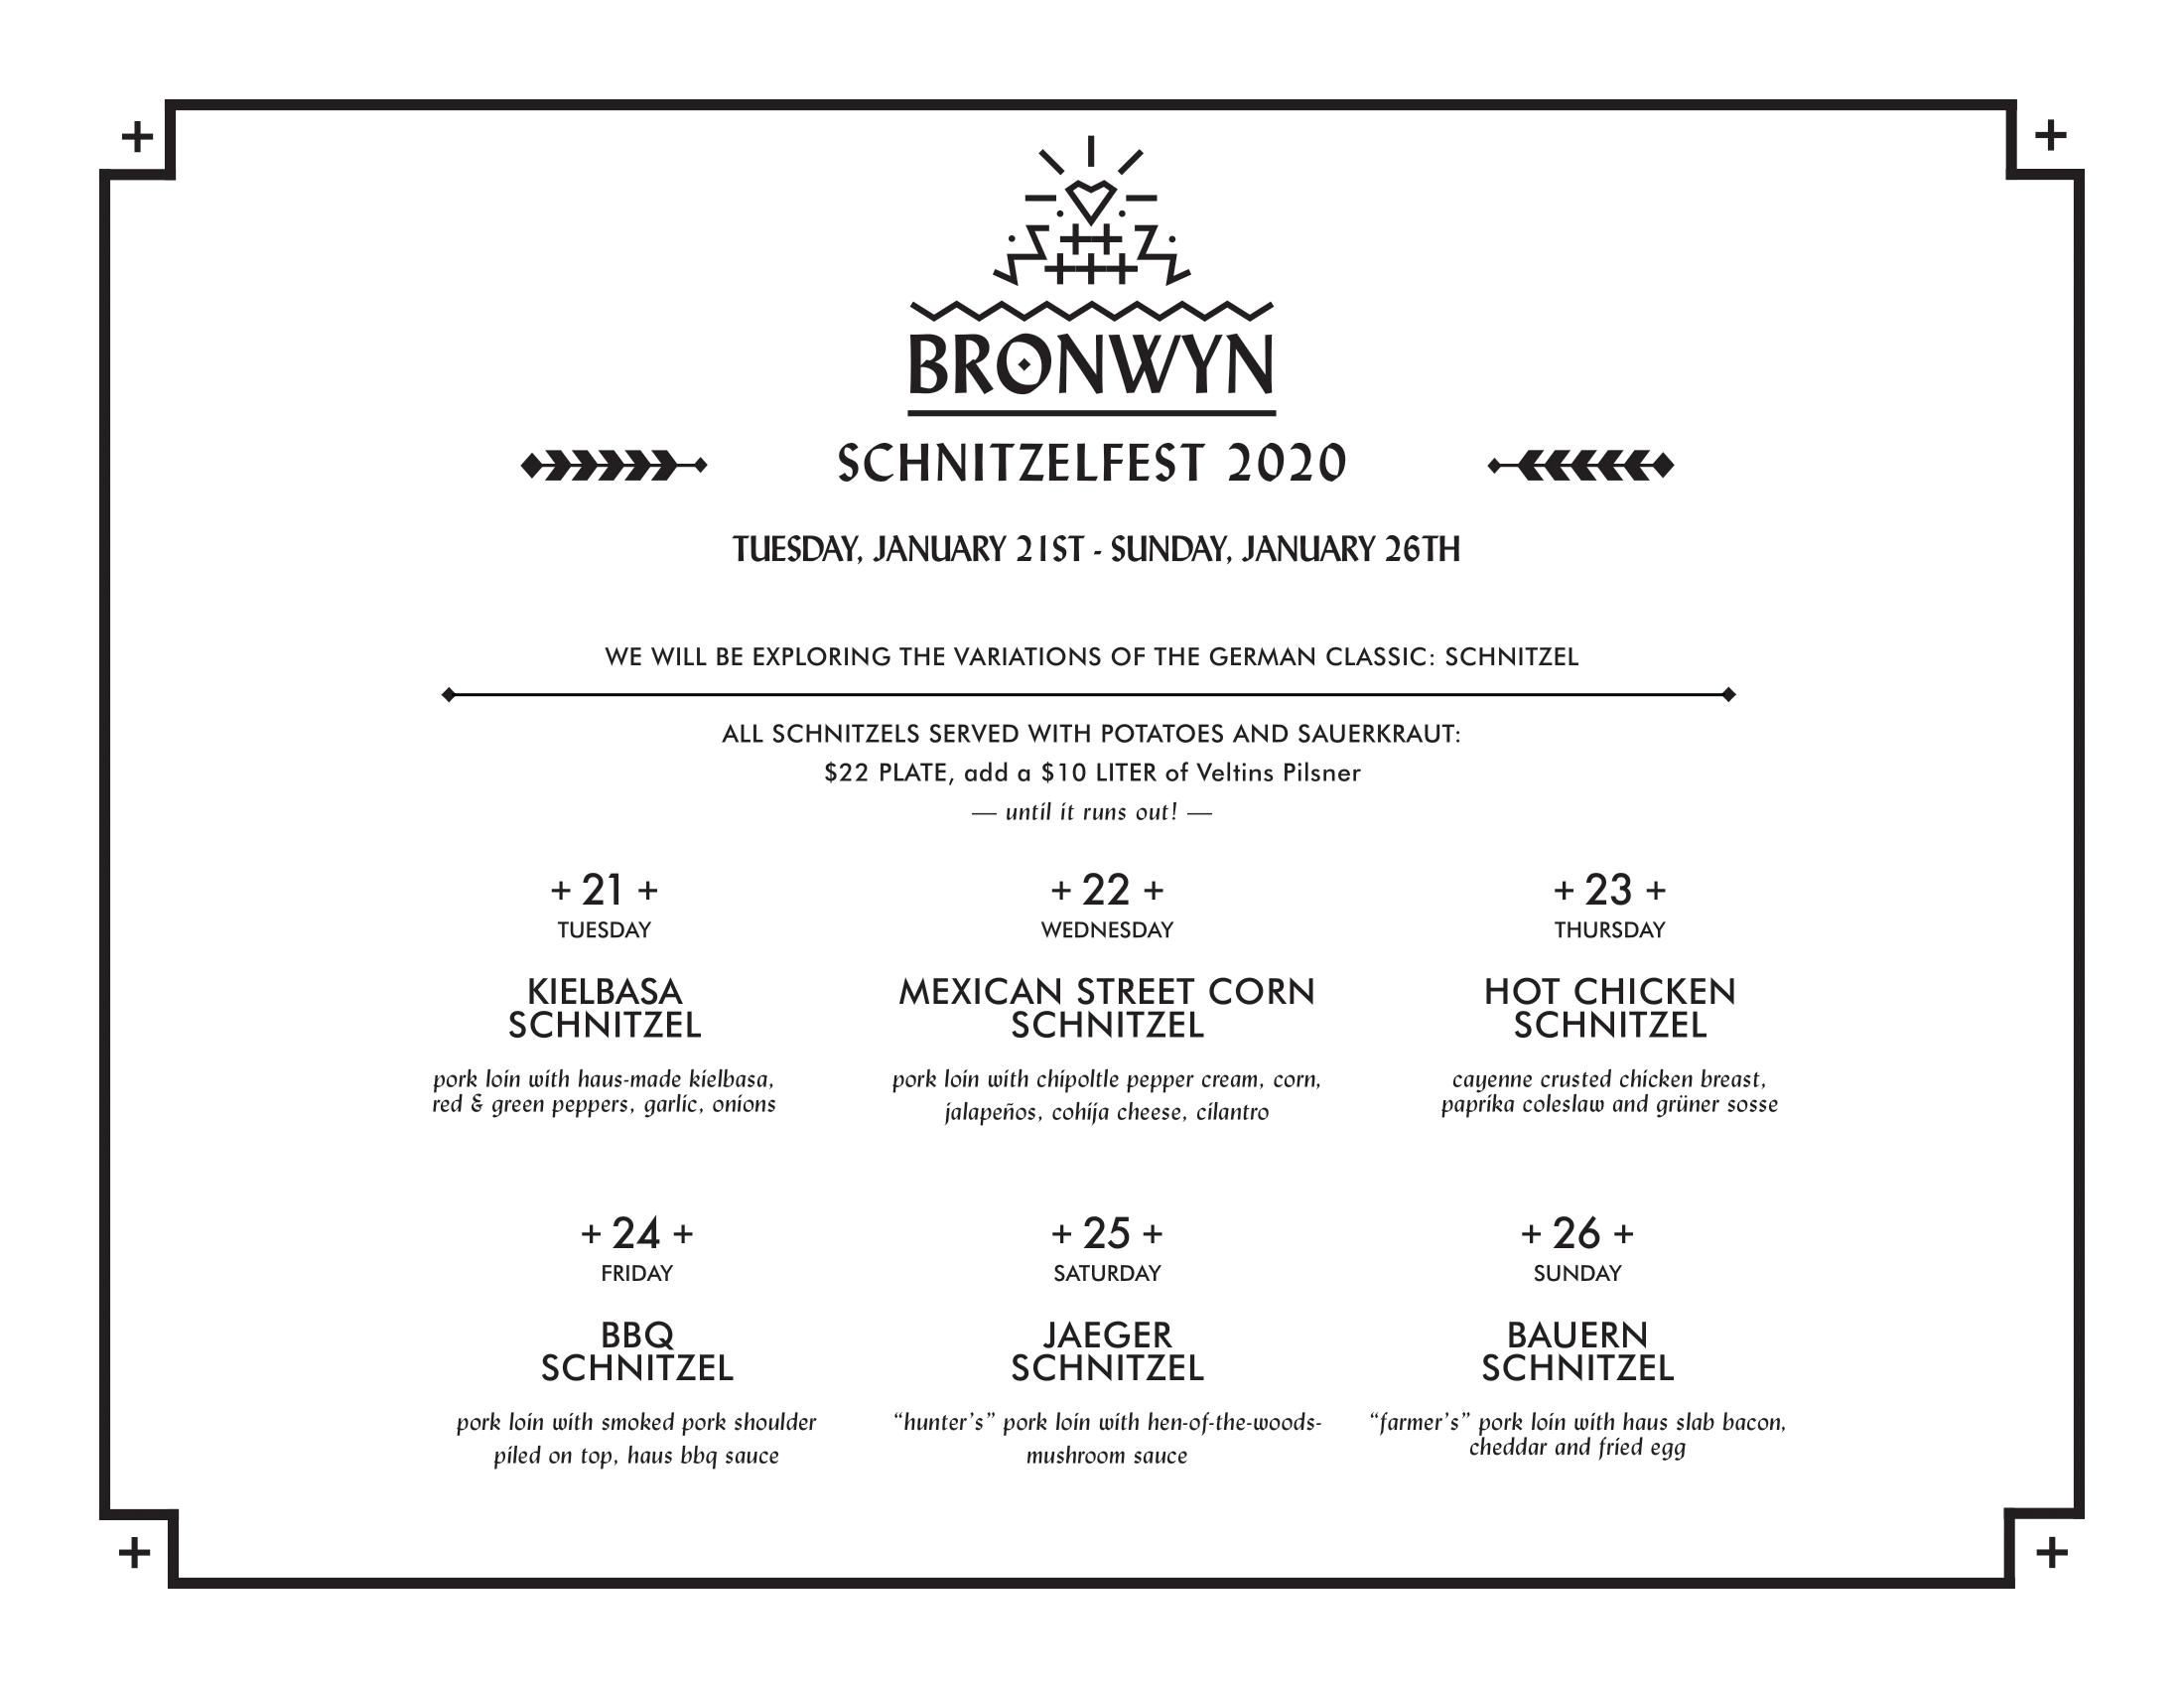 Bronwyn_Valentine's 2020